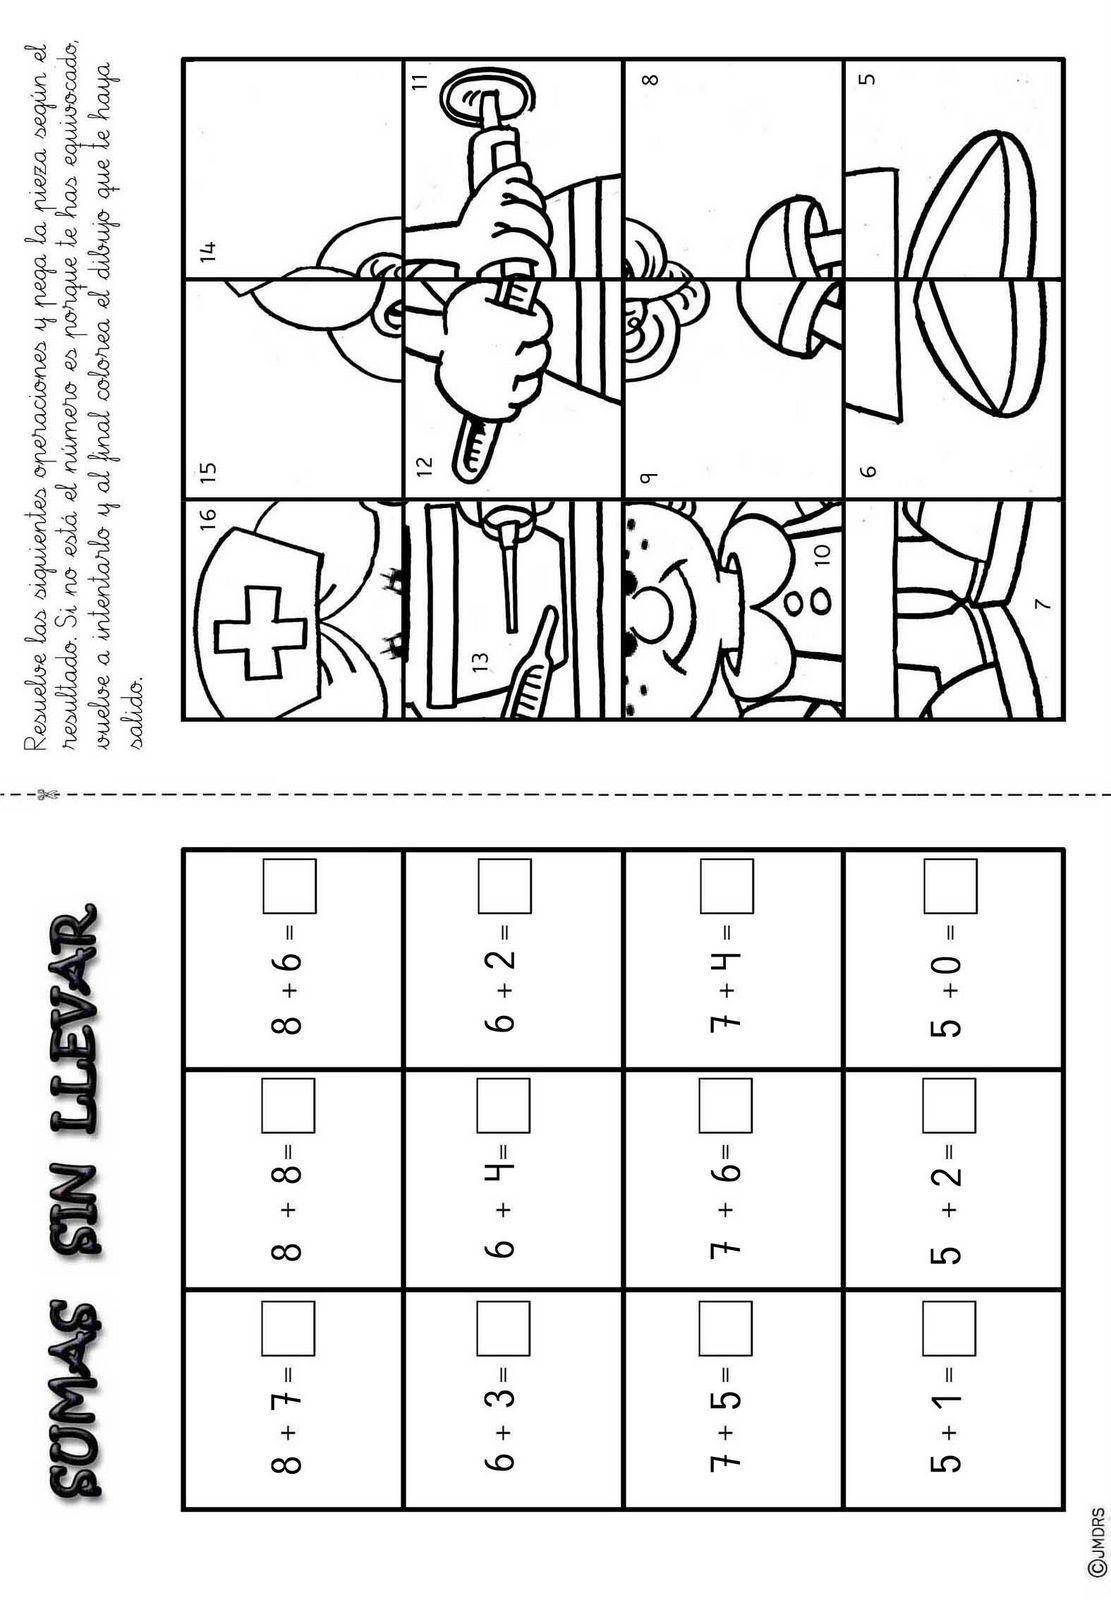 010103-sumas-sin-llevar-1-dc3adgito-puzzle-h2.jpg (1111×1600 ...